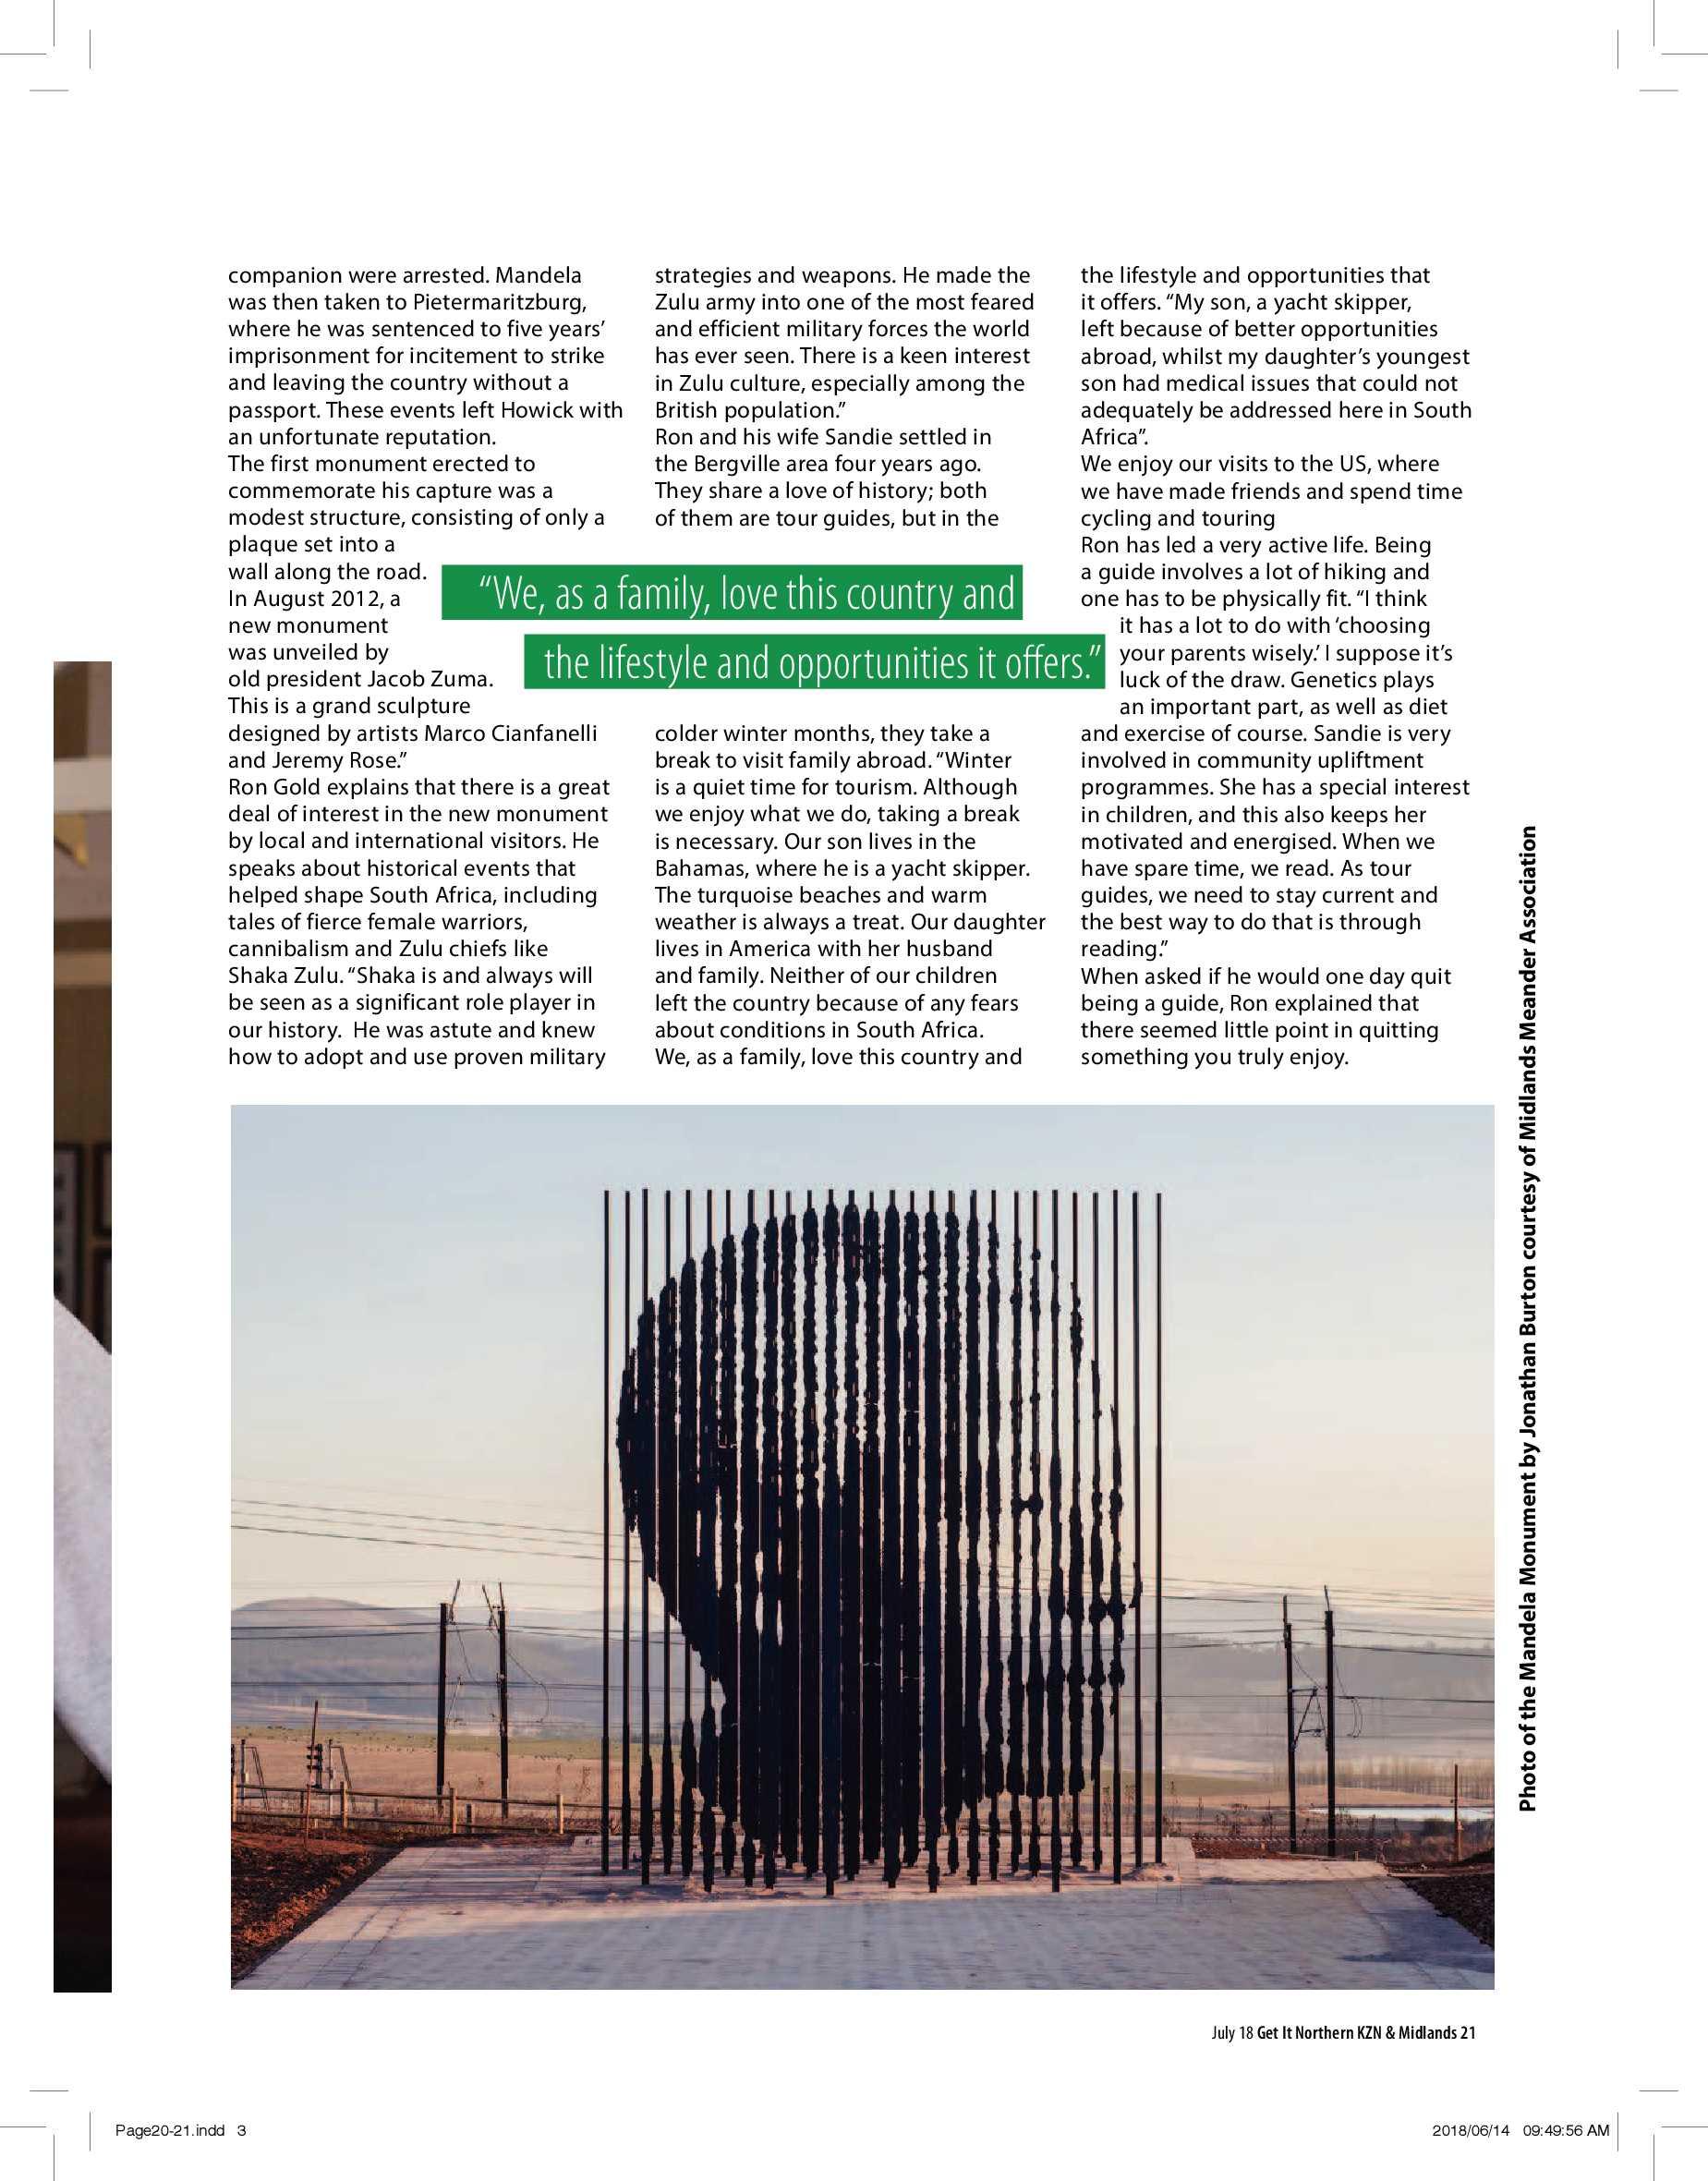 northern-kzn-midlands-get-july-2018-epapers-page-23